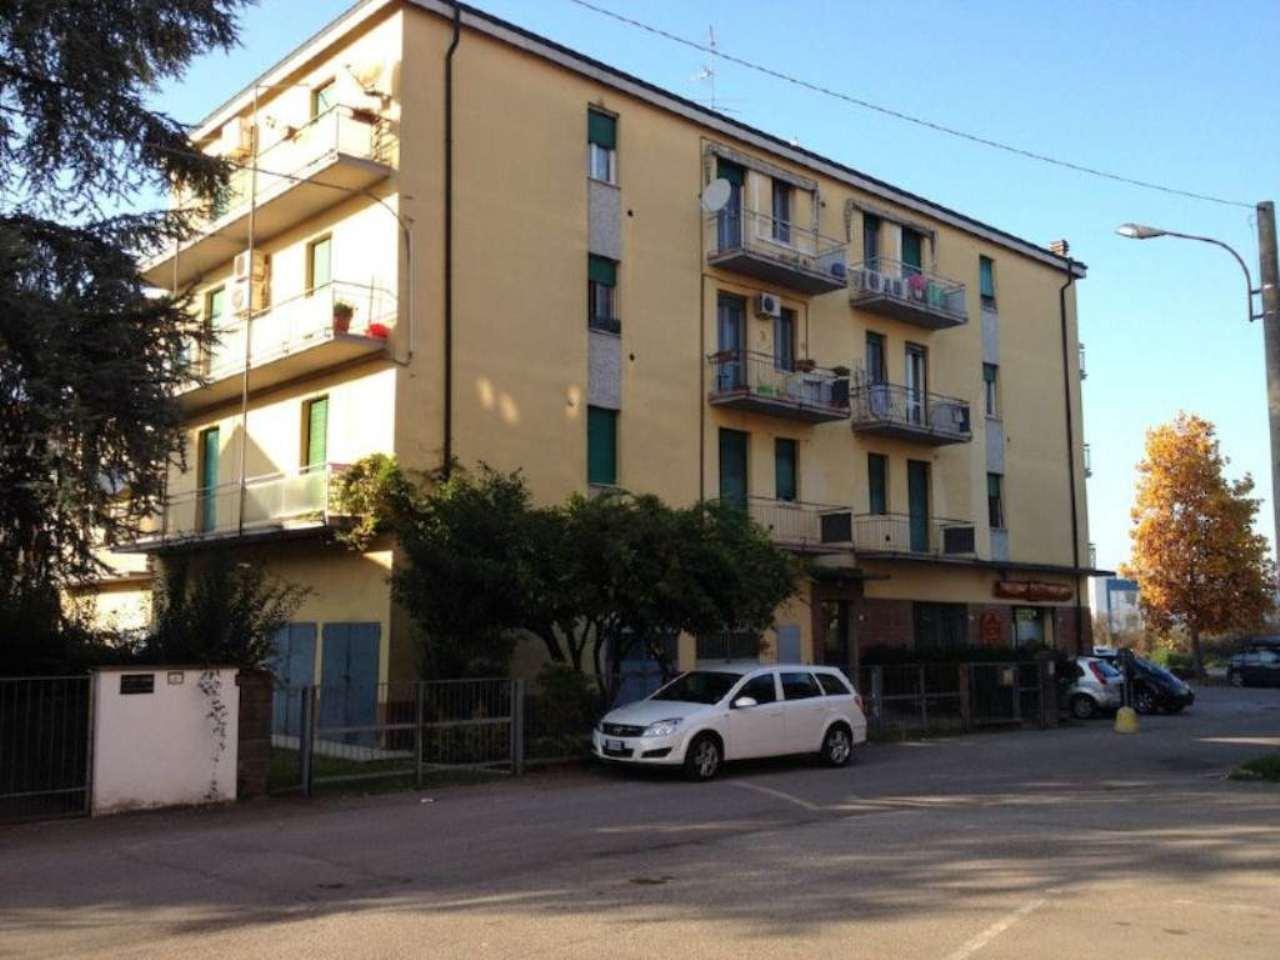 Appartamento in Vendita a Sant'Ilario d'Enza